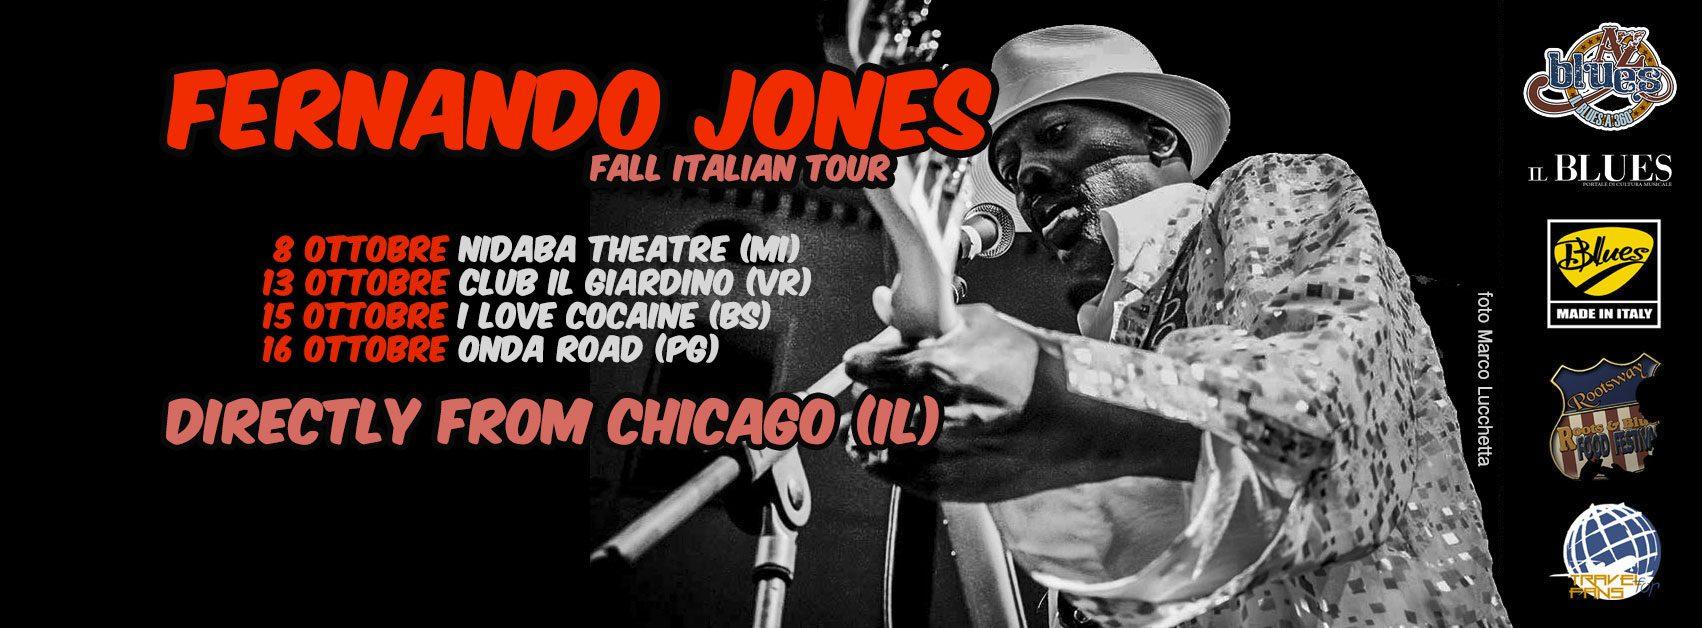 AZ-Blues-Fernando-Jones-Fall-Italian-Tour